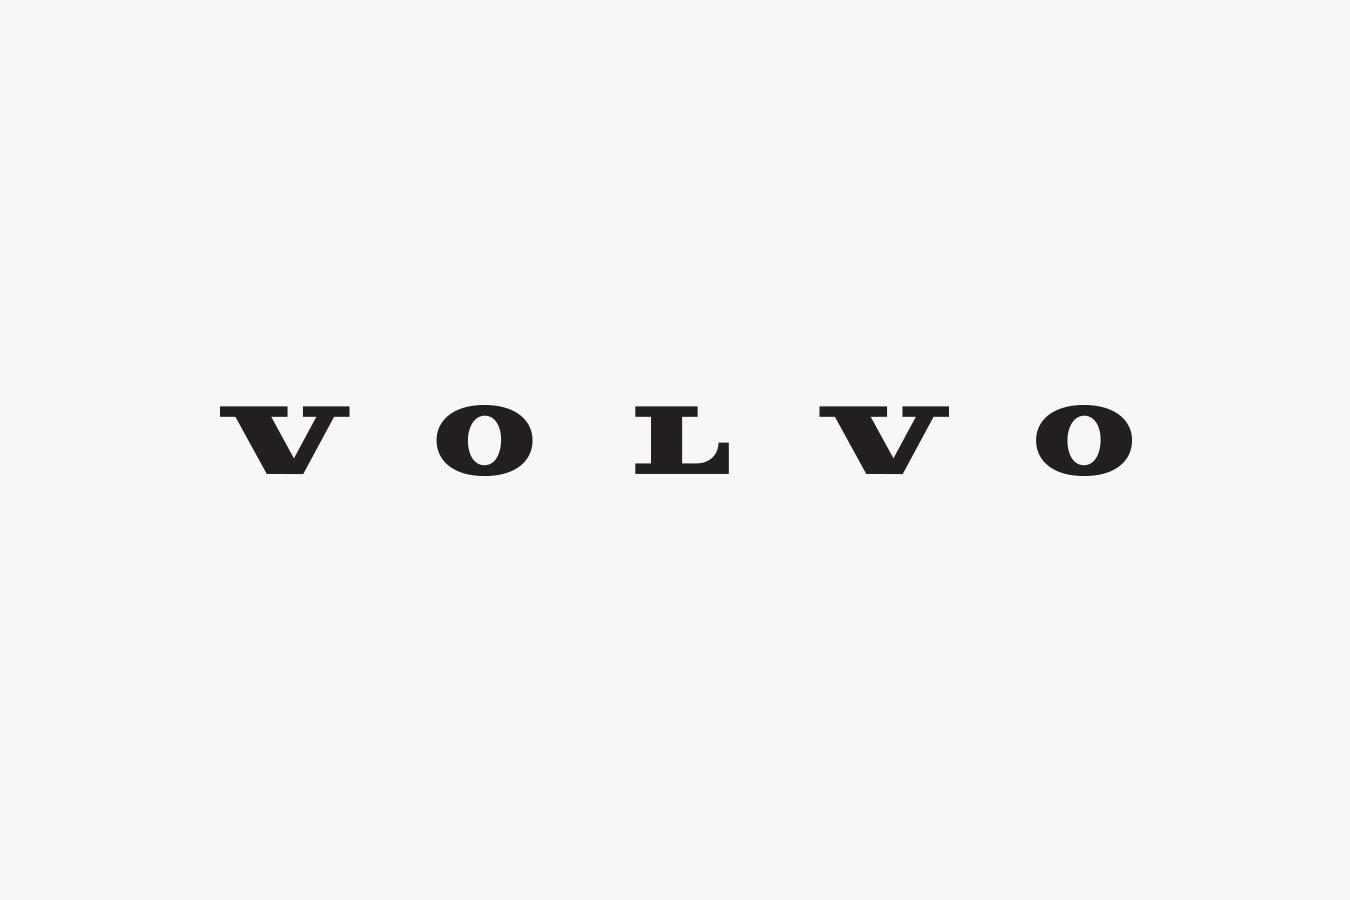 Lars Wrebo - Senior Vice President Purchasing & Manufacturing, Volvo Cars